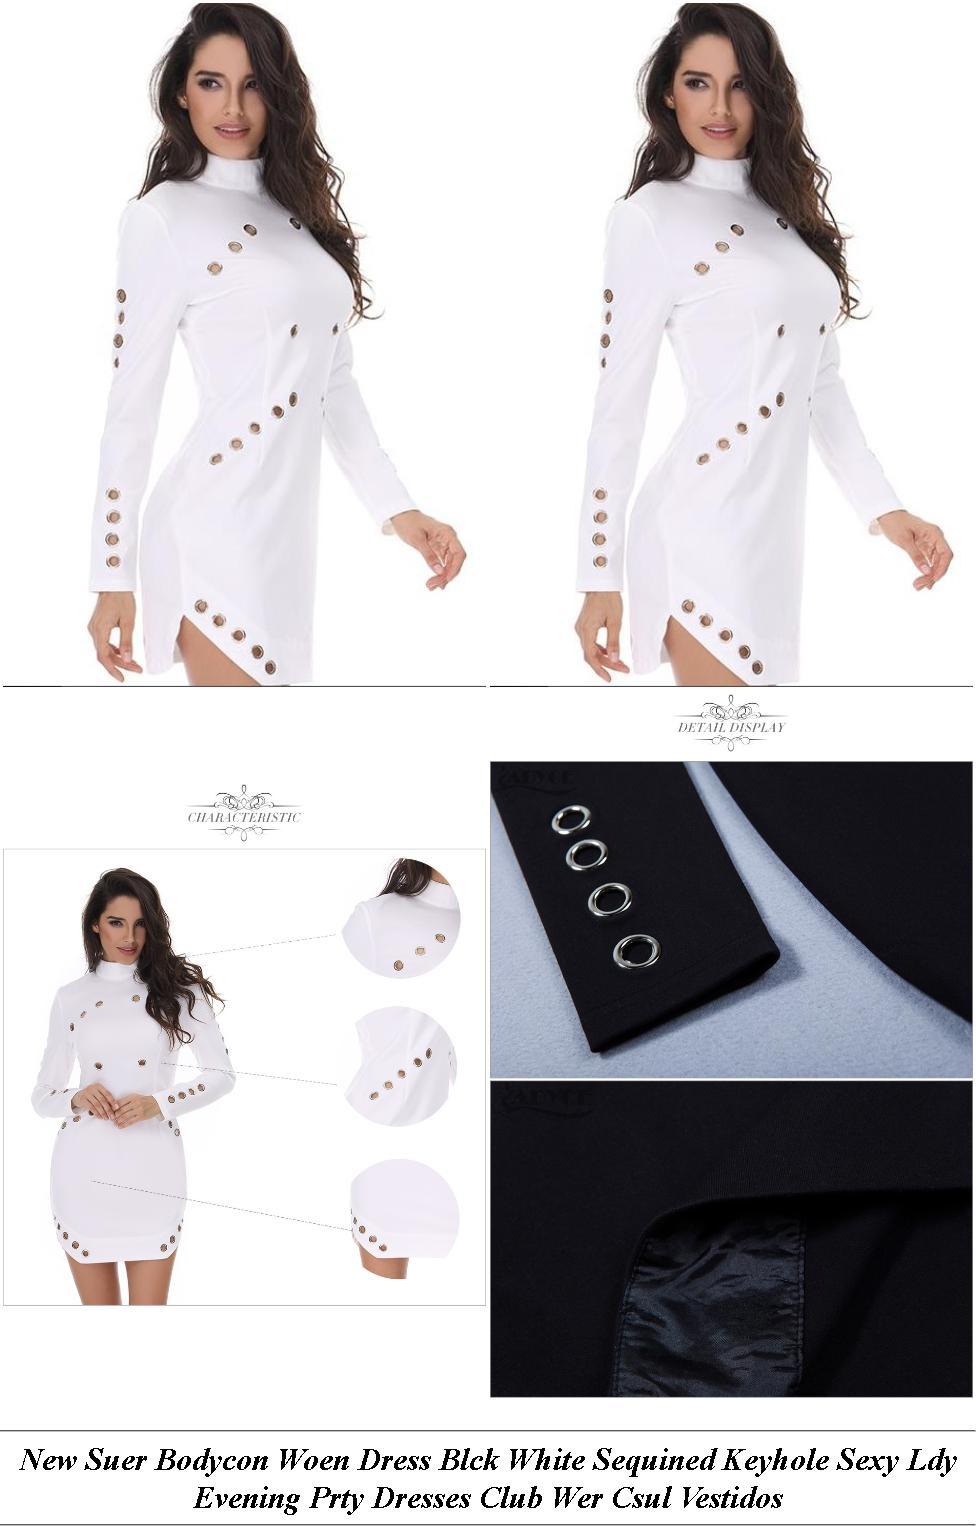 Plus Size Dresses For Women - Winter Clearance Sale - Floral Dress - Cheap Womens Summer Clothes